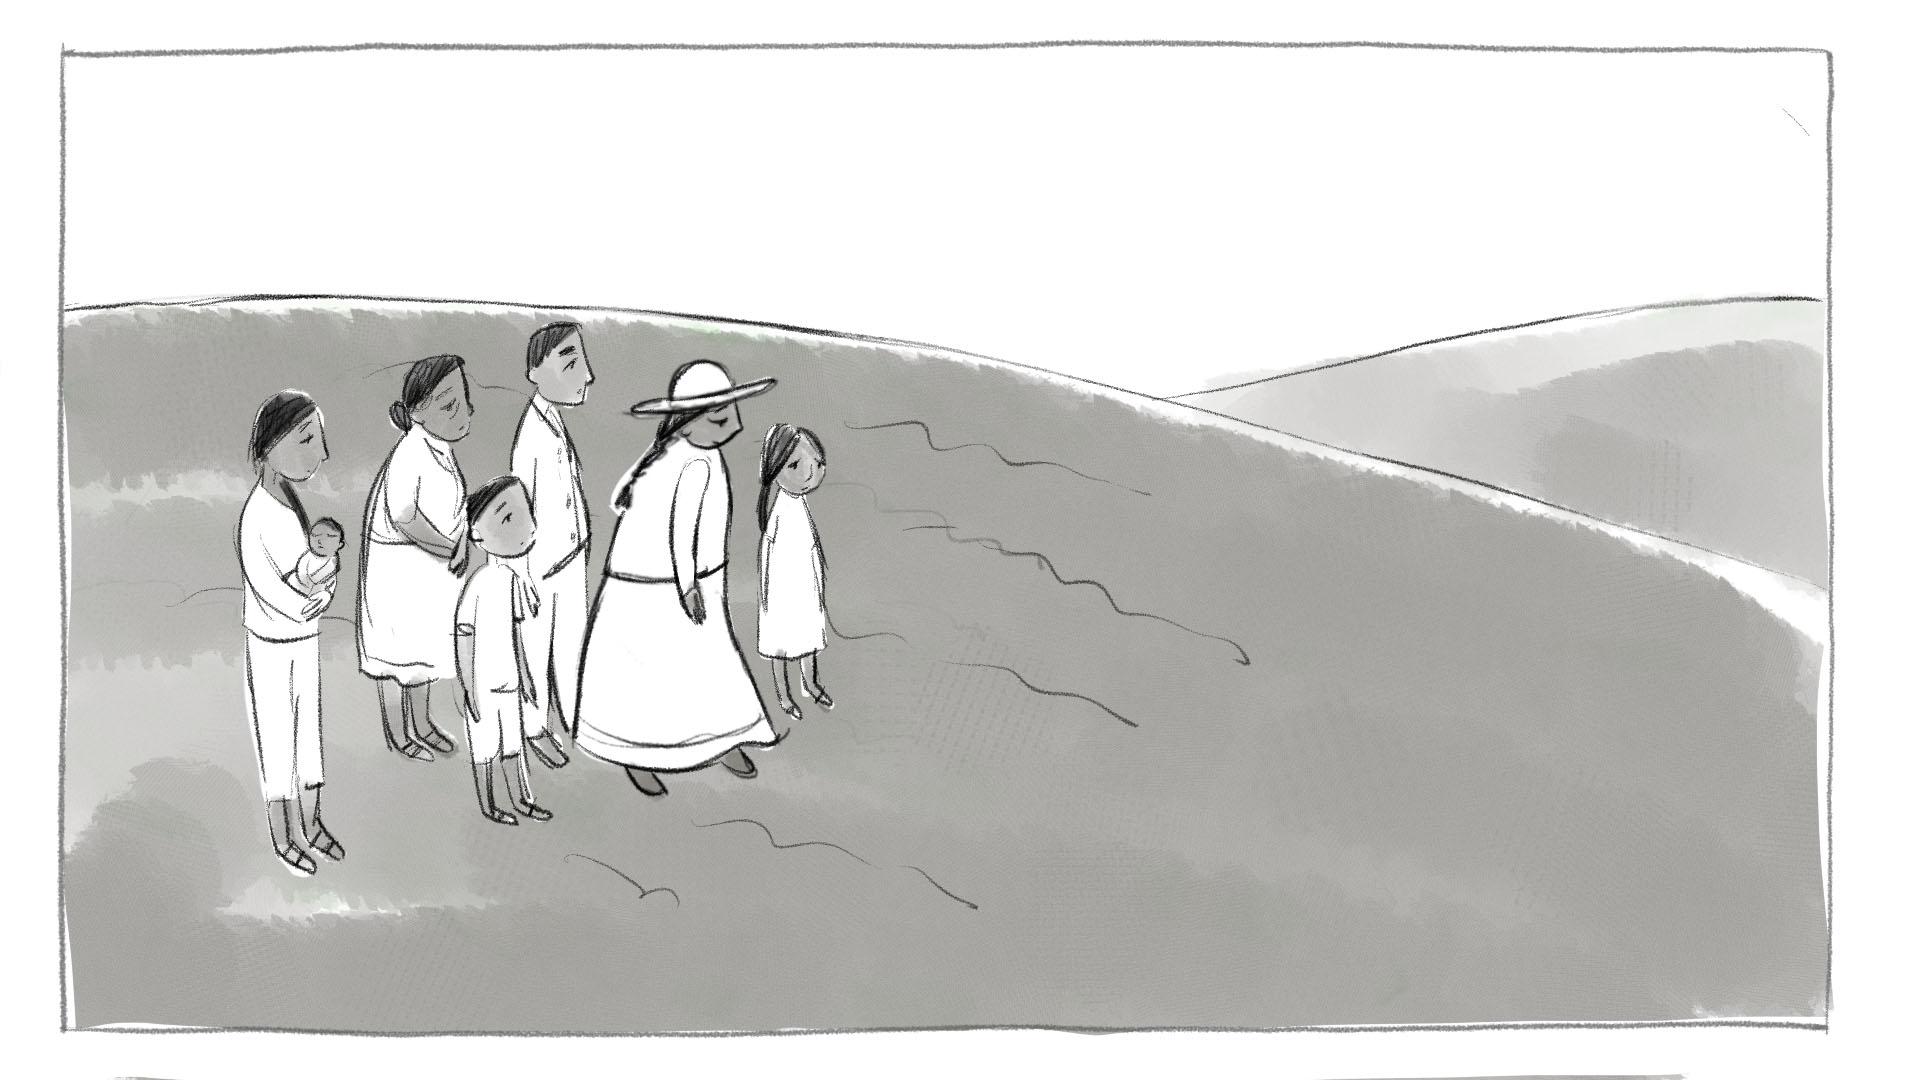 Shahidi_Storyboards_3c-1.jpg